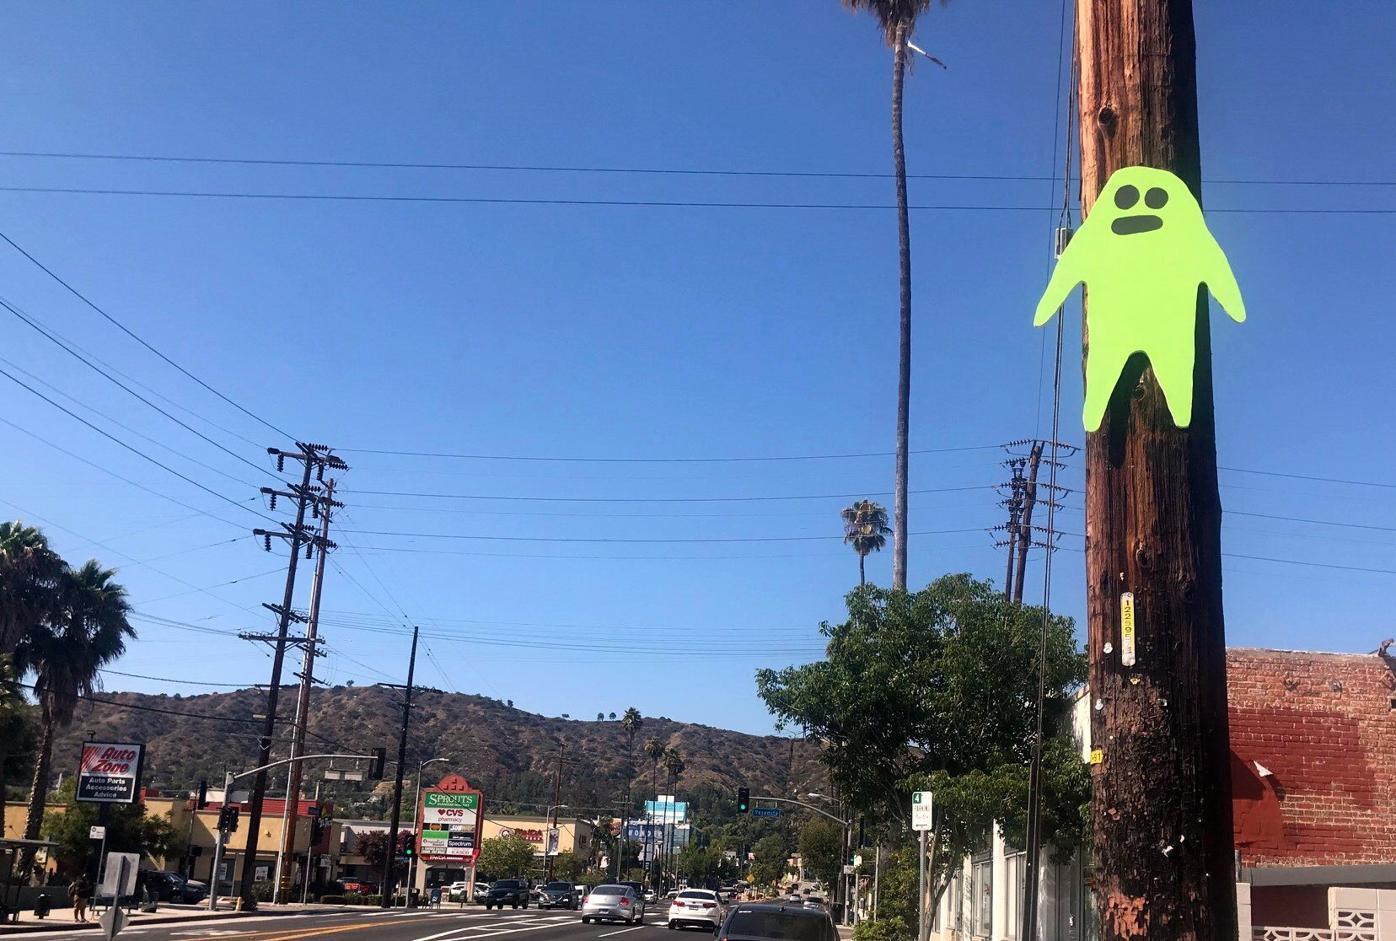 Ghost on Eagle ROck Blvd